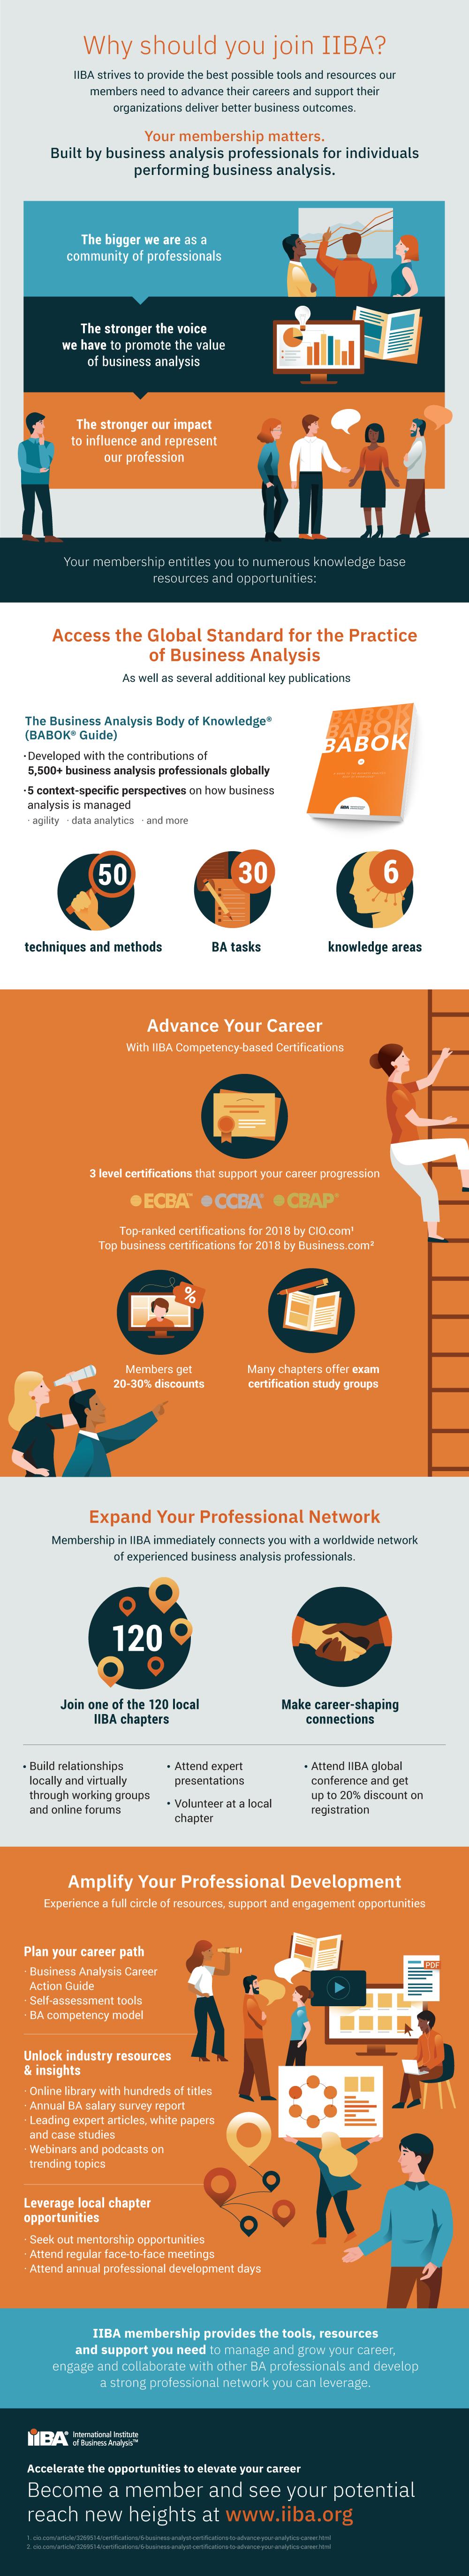 IIBA Recruitment Infographic